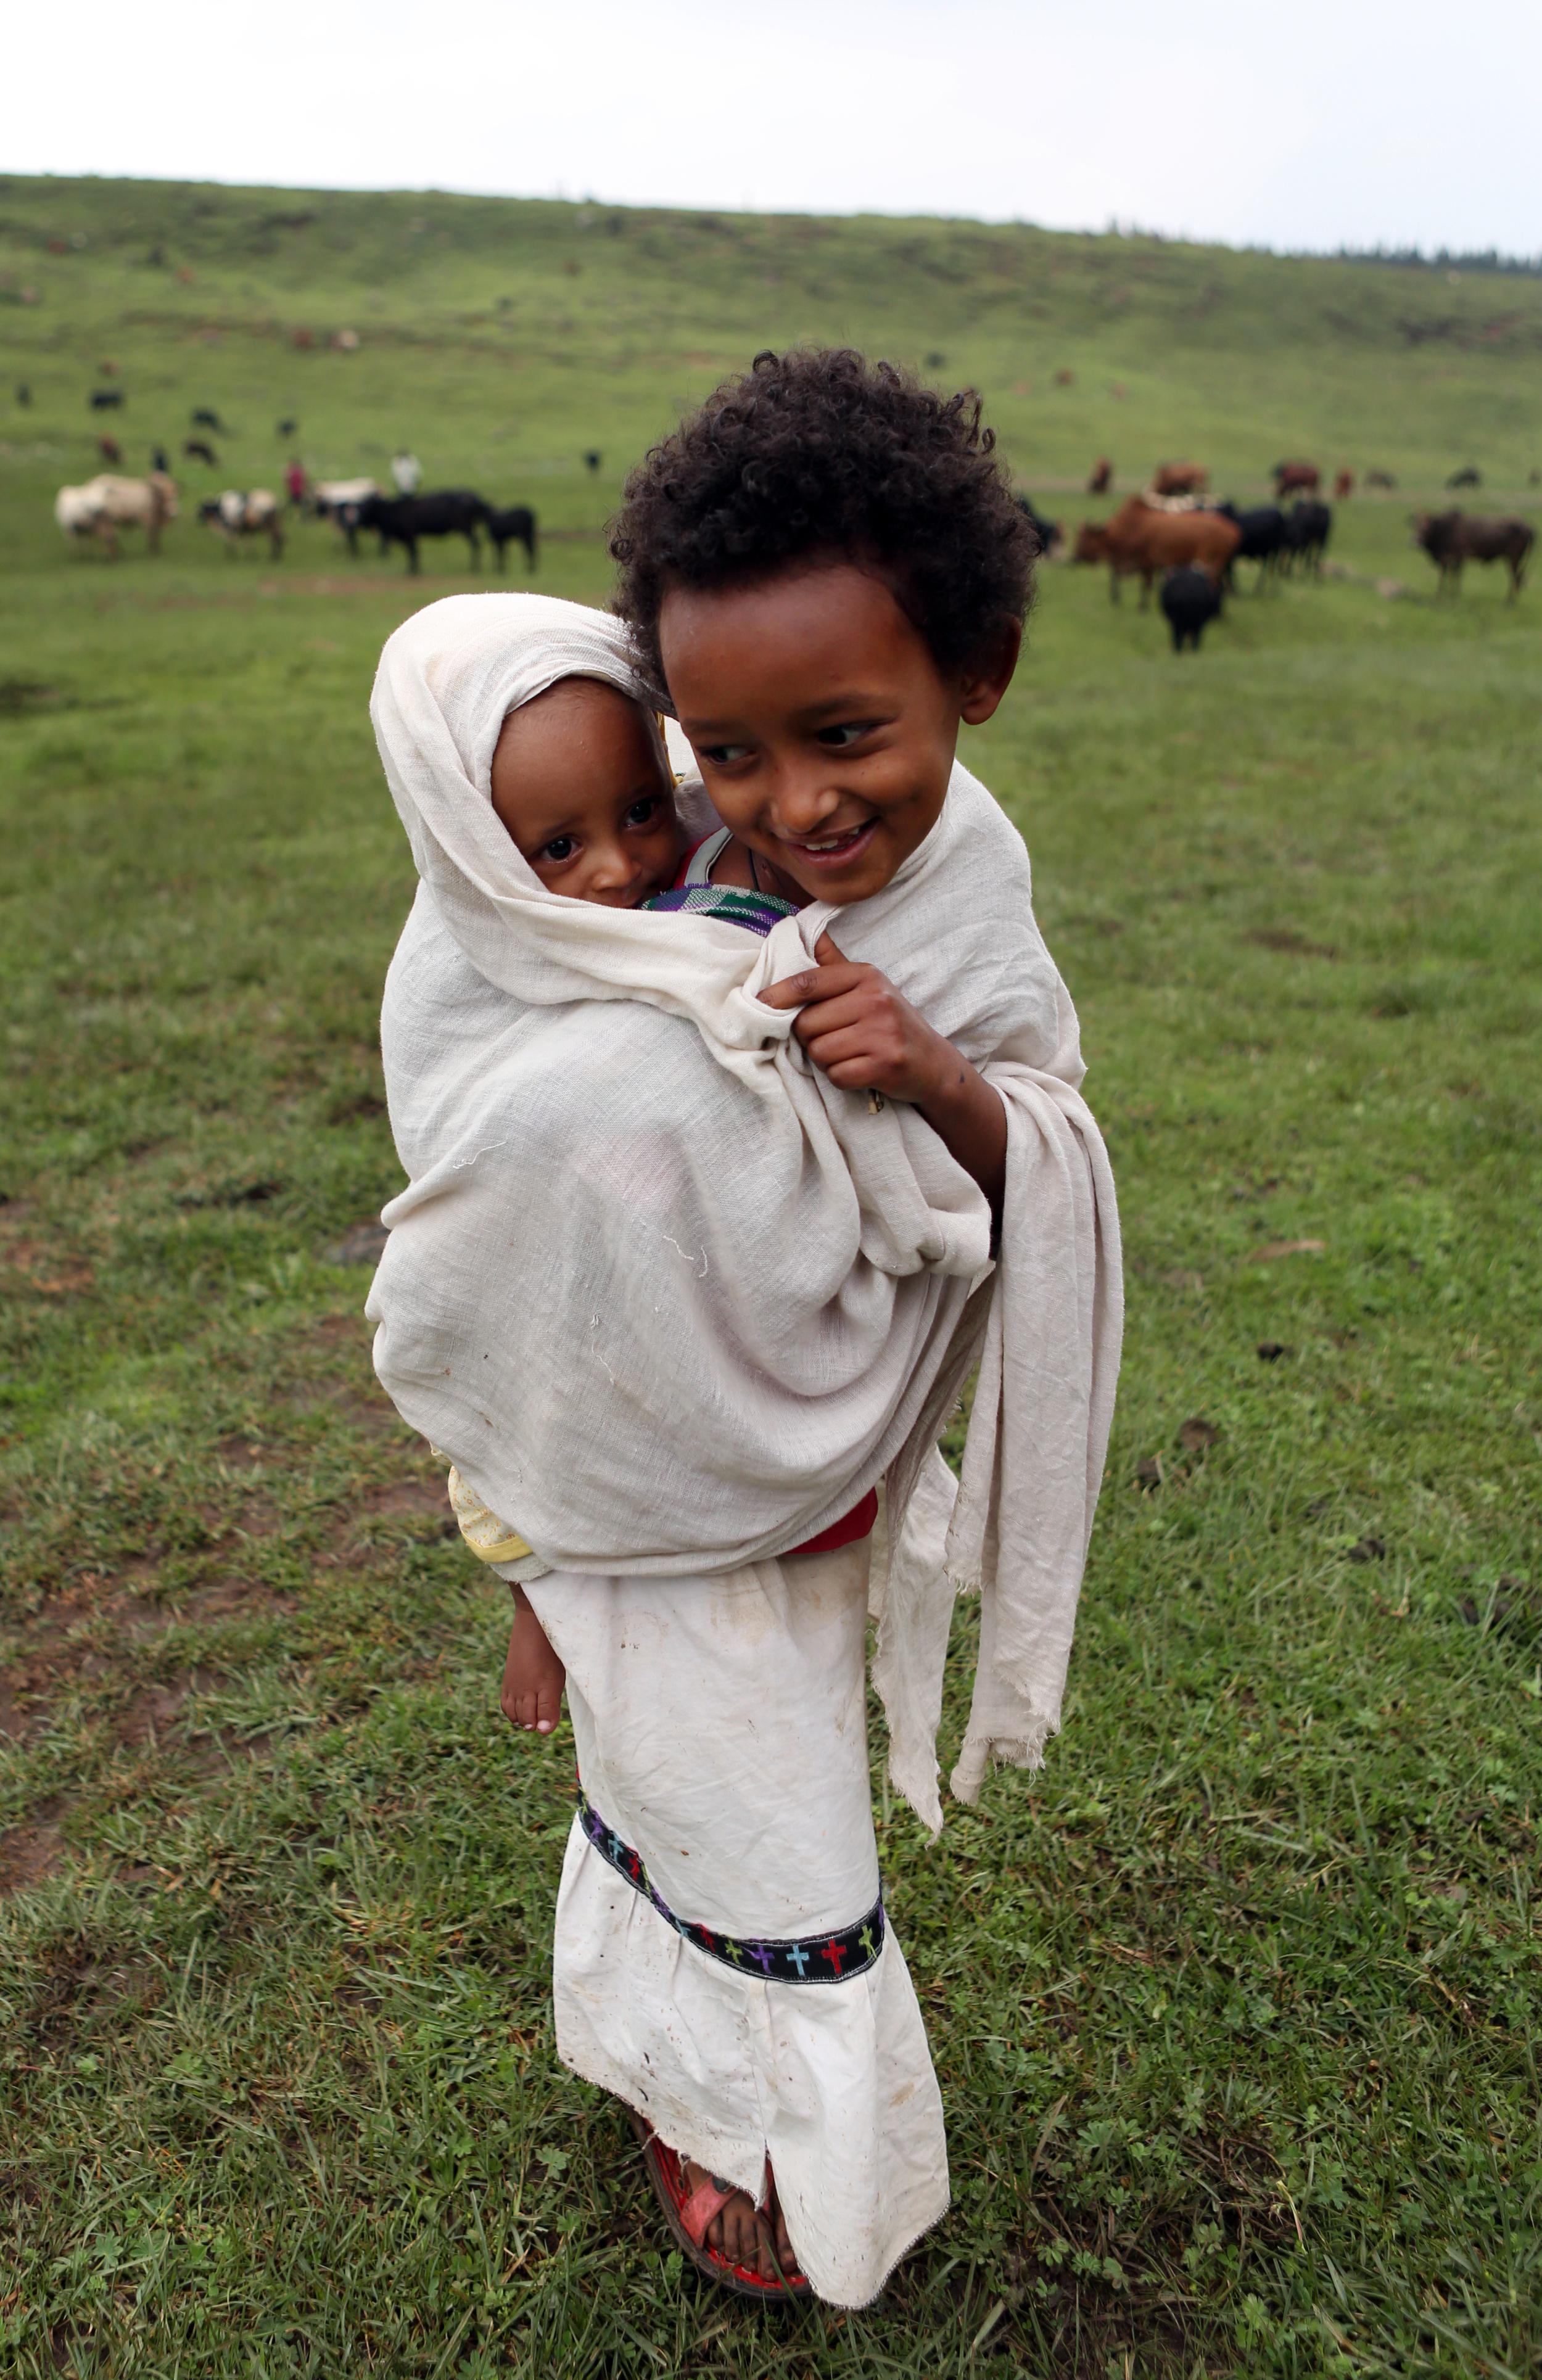 uk_Ethiopia_day4_1936_bdm.jpg